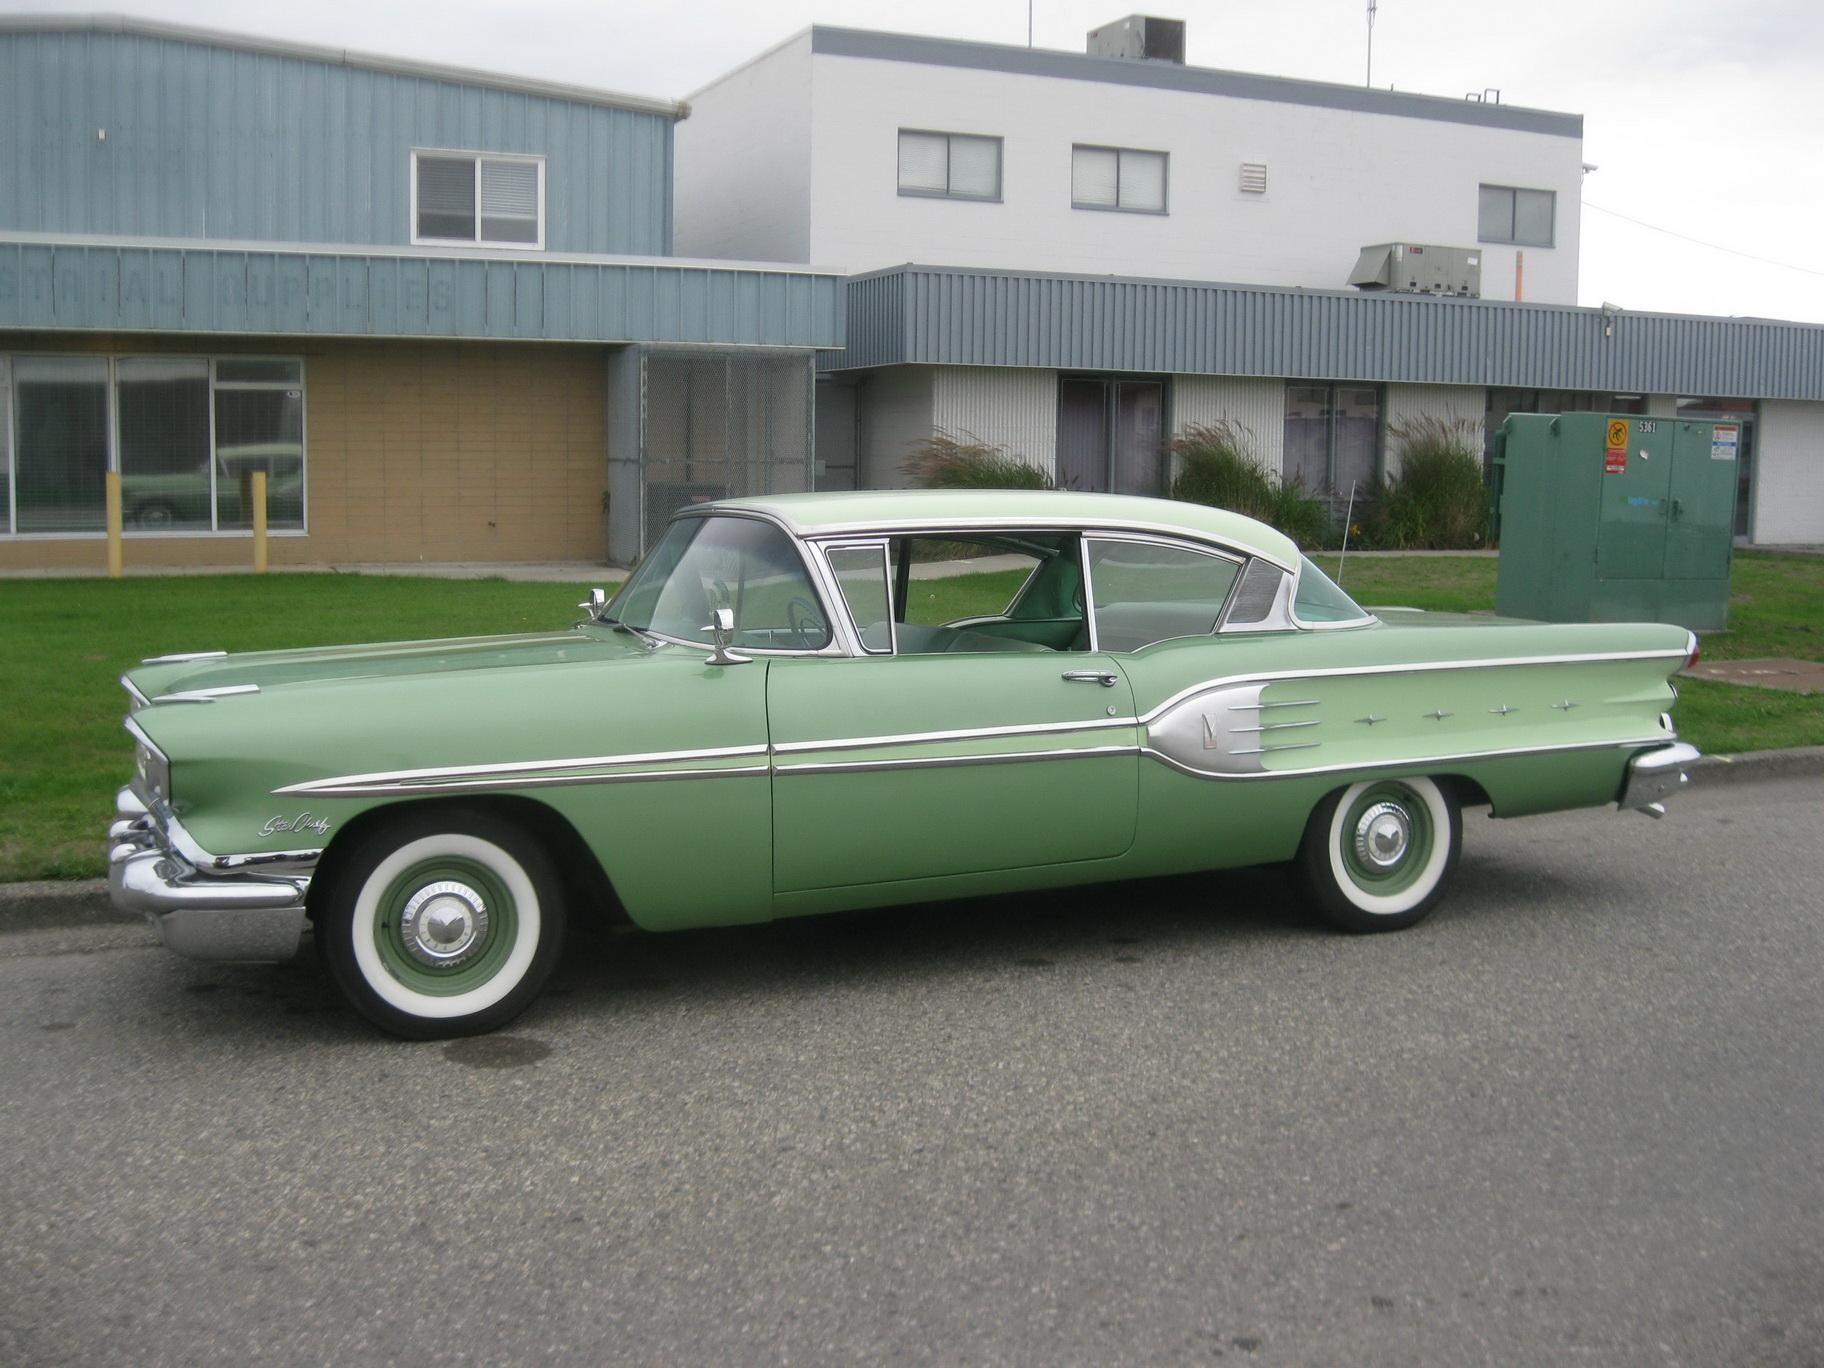 1958 Pontiac Star Chief Hardtop American Model The Rod God 1960 1 24